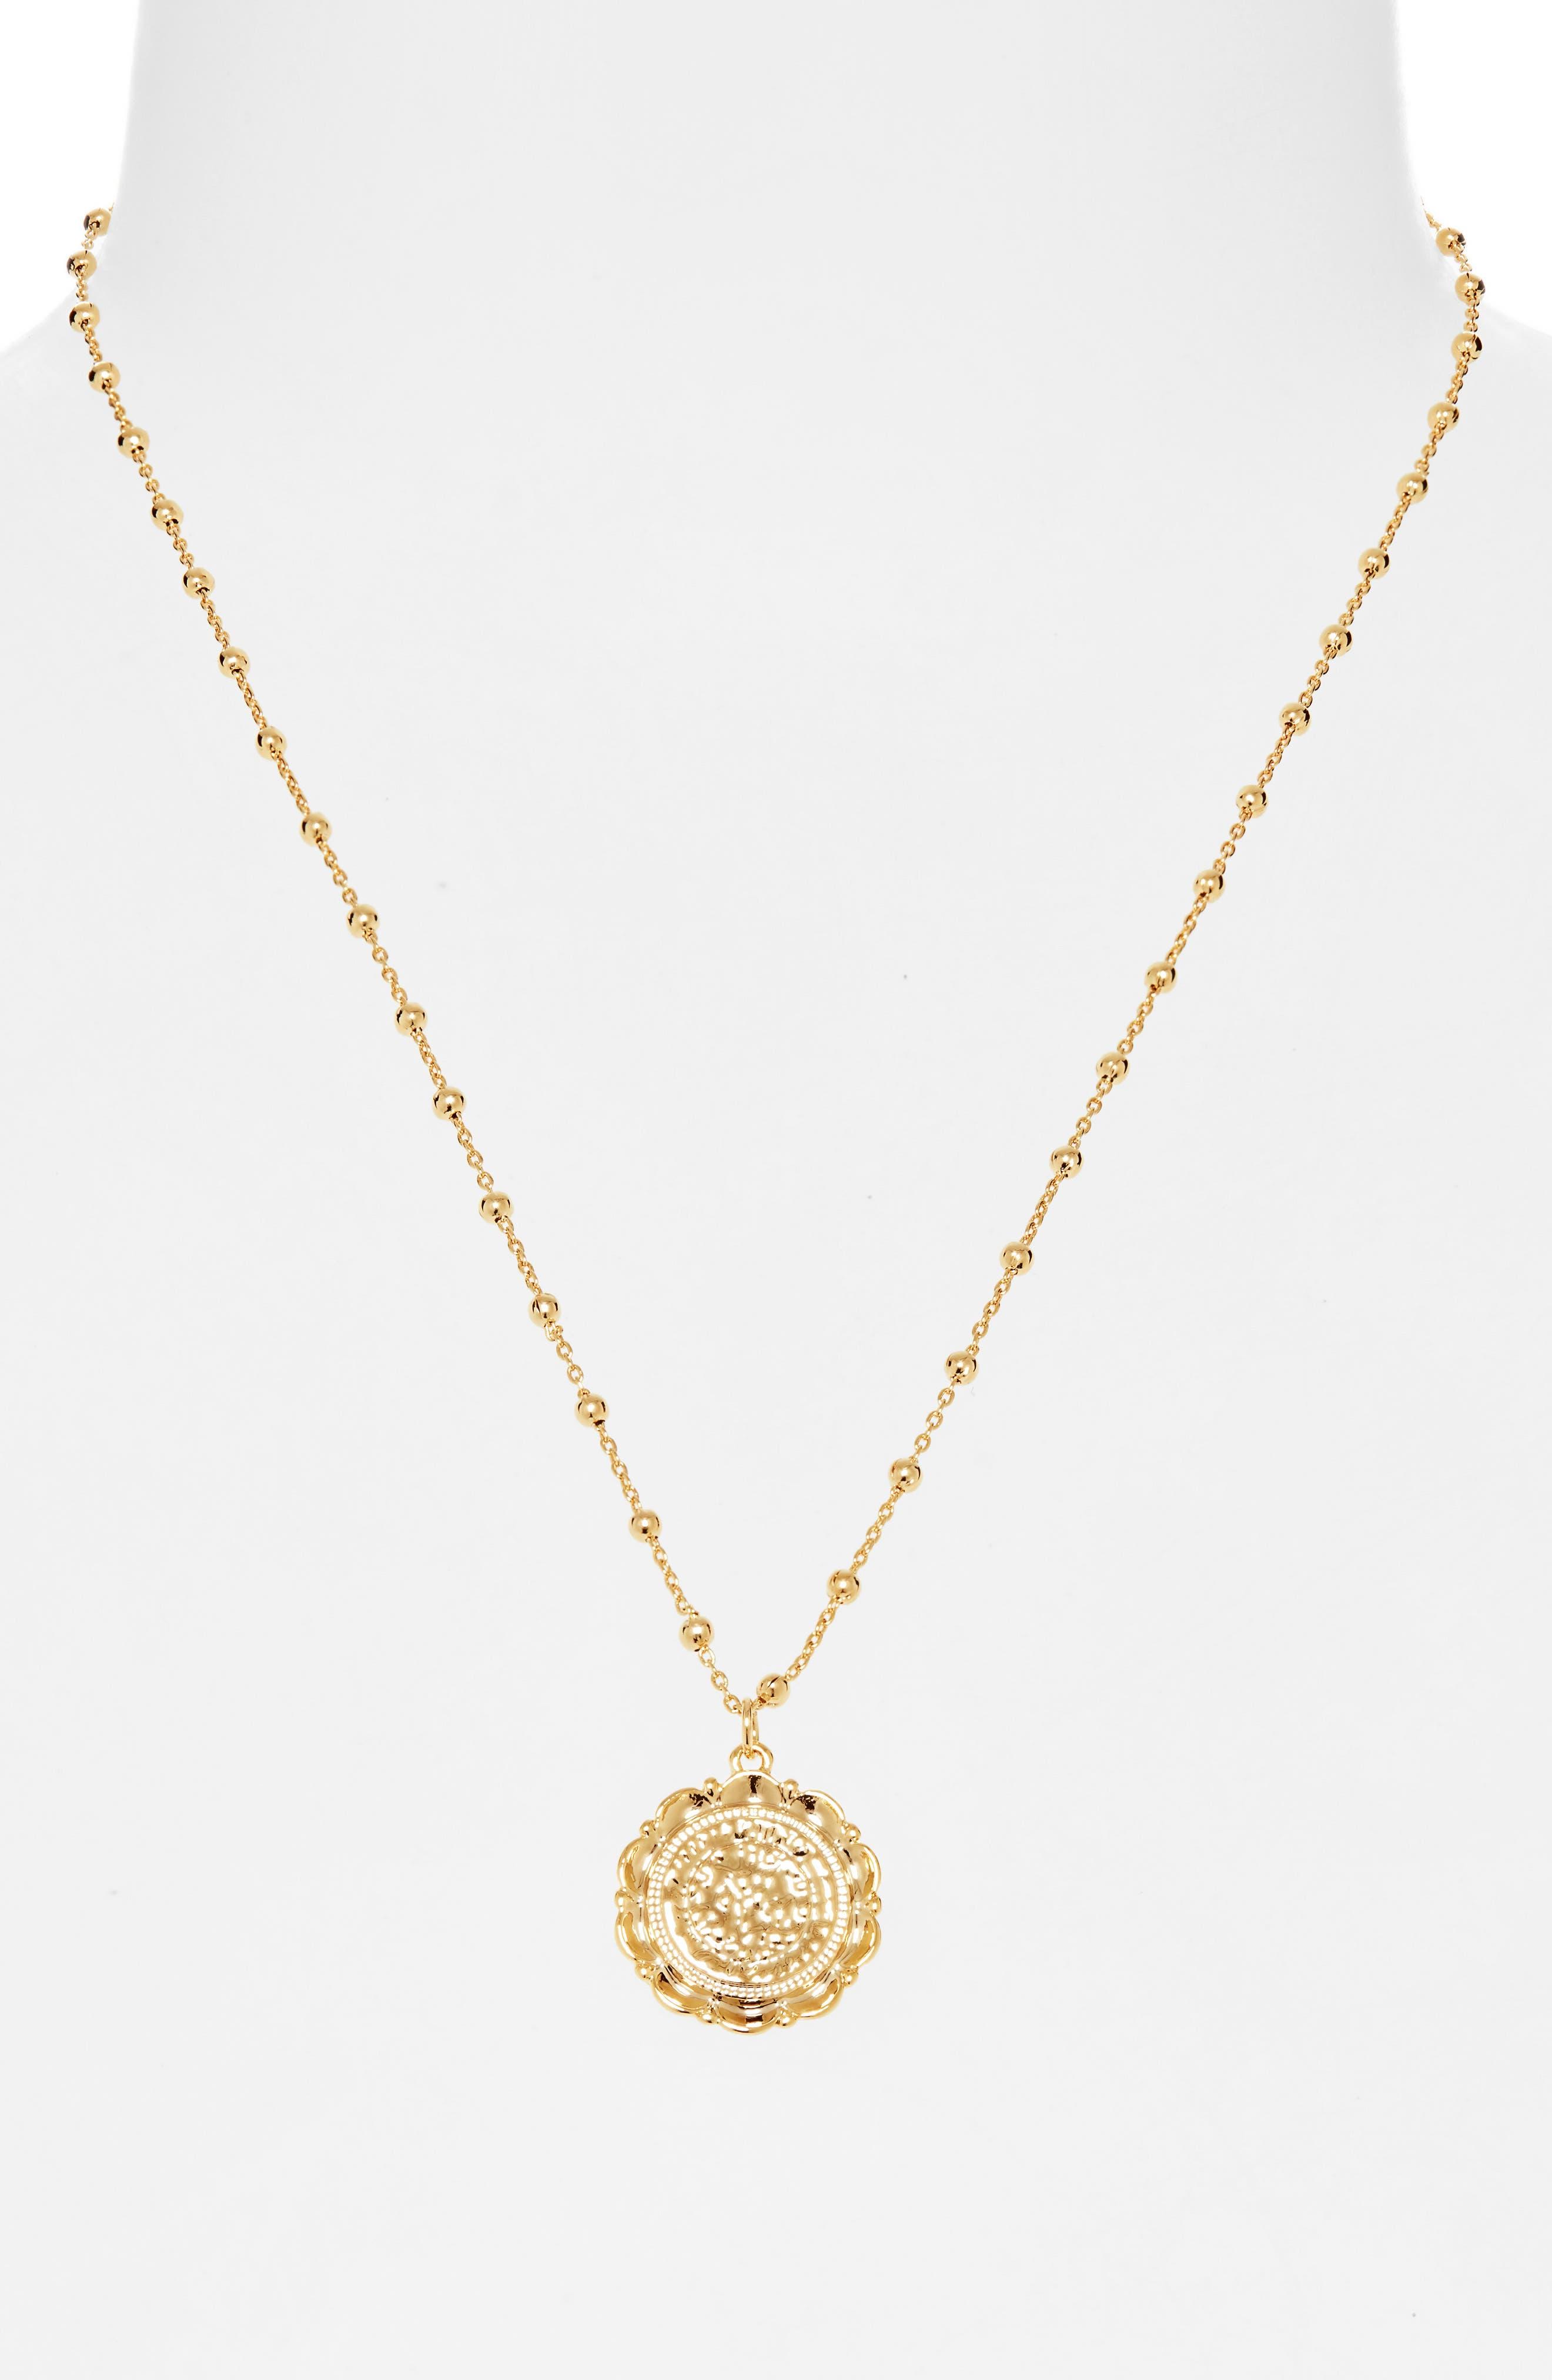 UNCOMMON JAMES BY KRISTIN CAVALLARI, Atocha Coin Necklace, Alternate thumbnail 2, color, GOLD